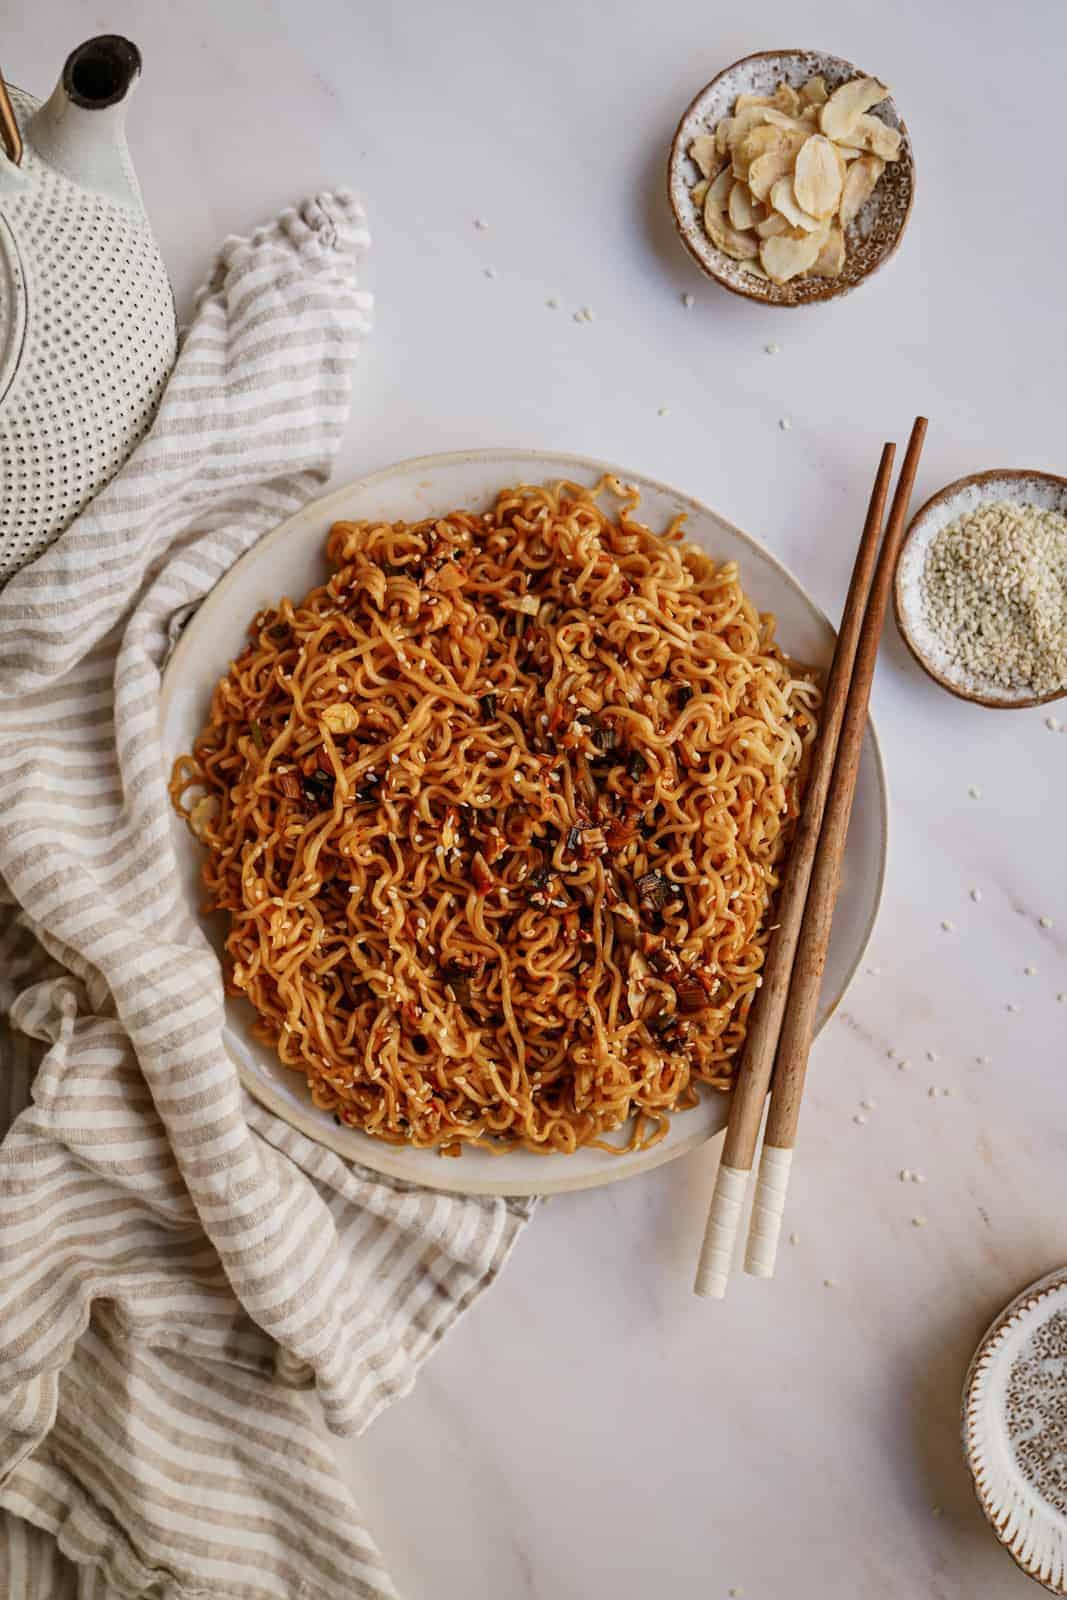 A plate of Vegan Sesame Garlic Noodles on a plate with chopsticks